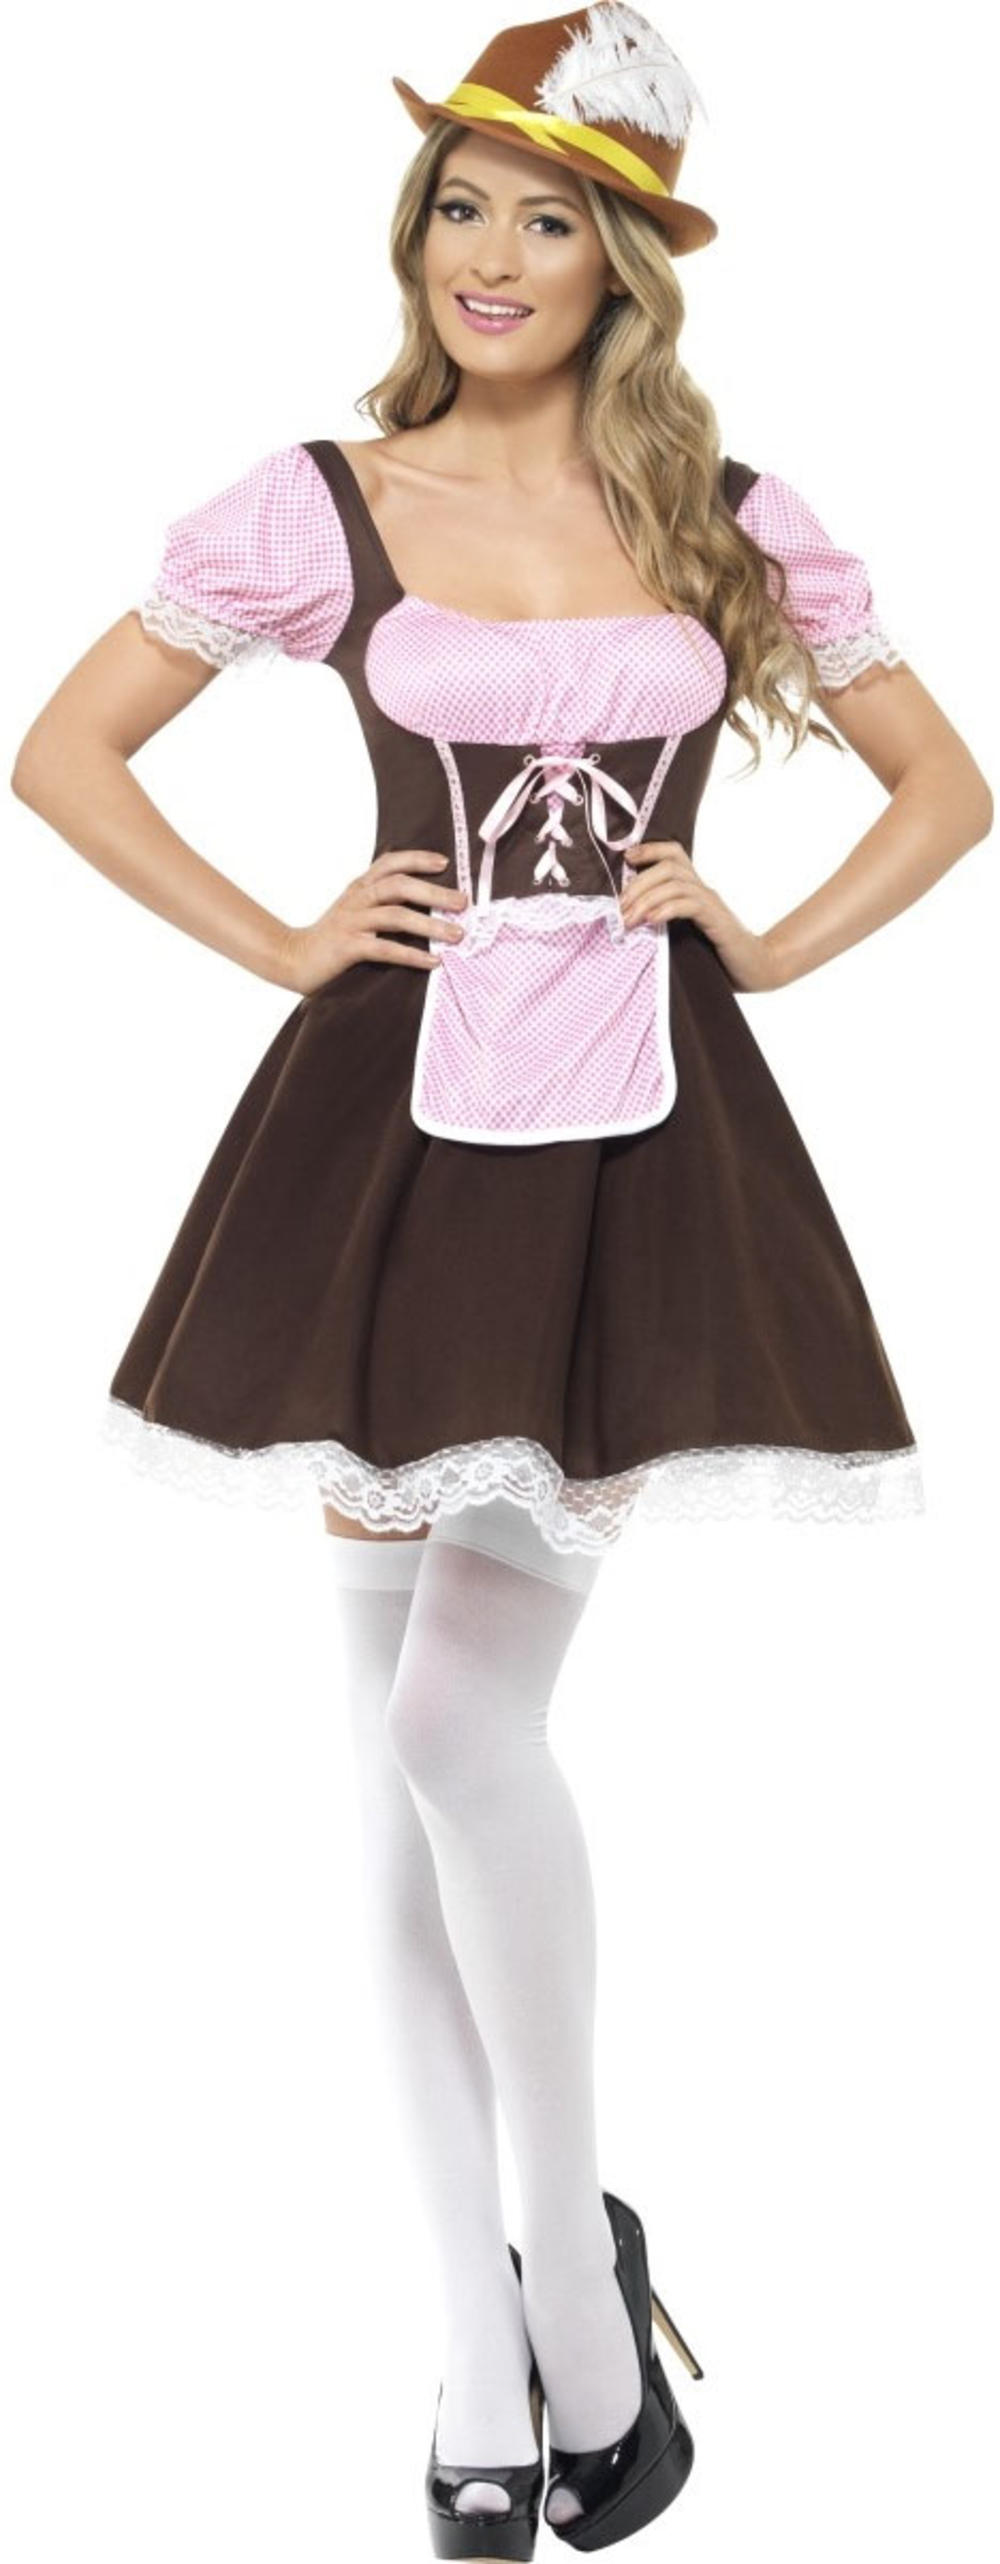 Bavarian Beer Tavern Girl Ladies Oktoberfest Fancy Dress German Waitress Costume